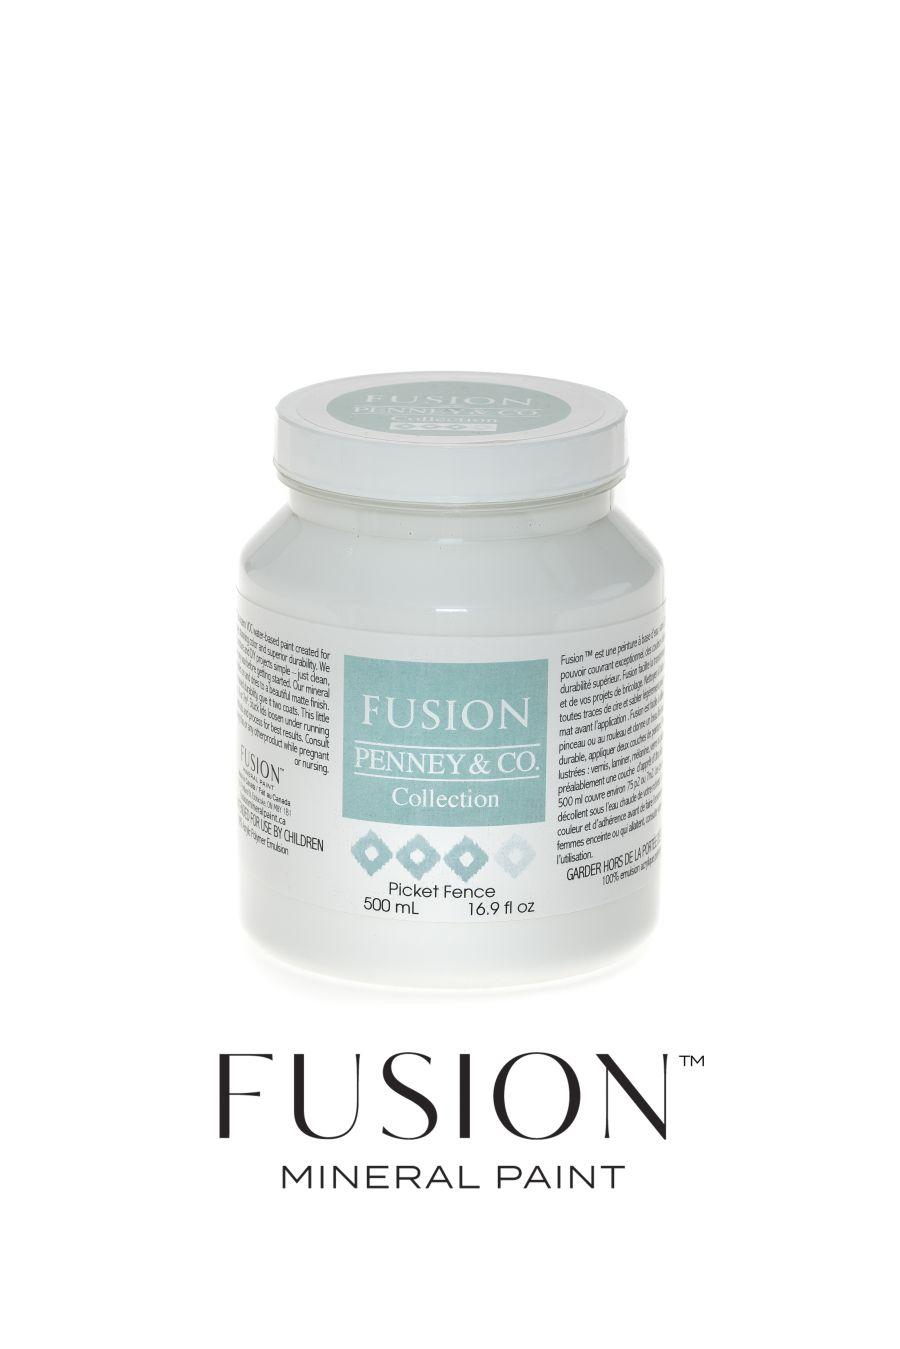 Grote Fusion Mineral Paint potten MaisonMansion